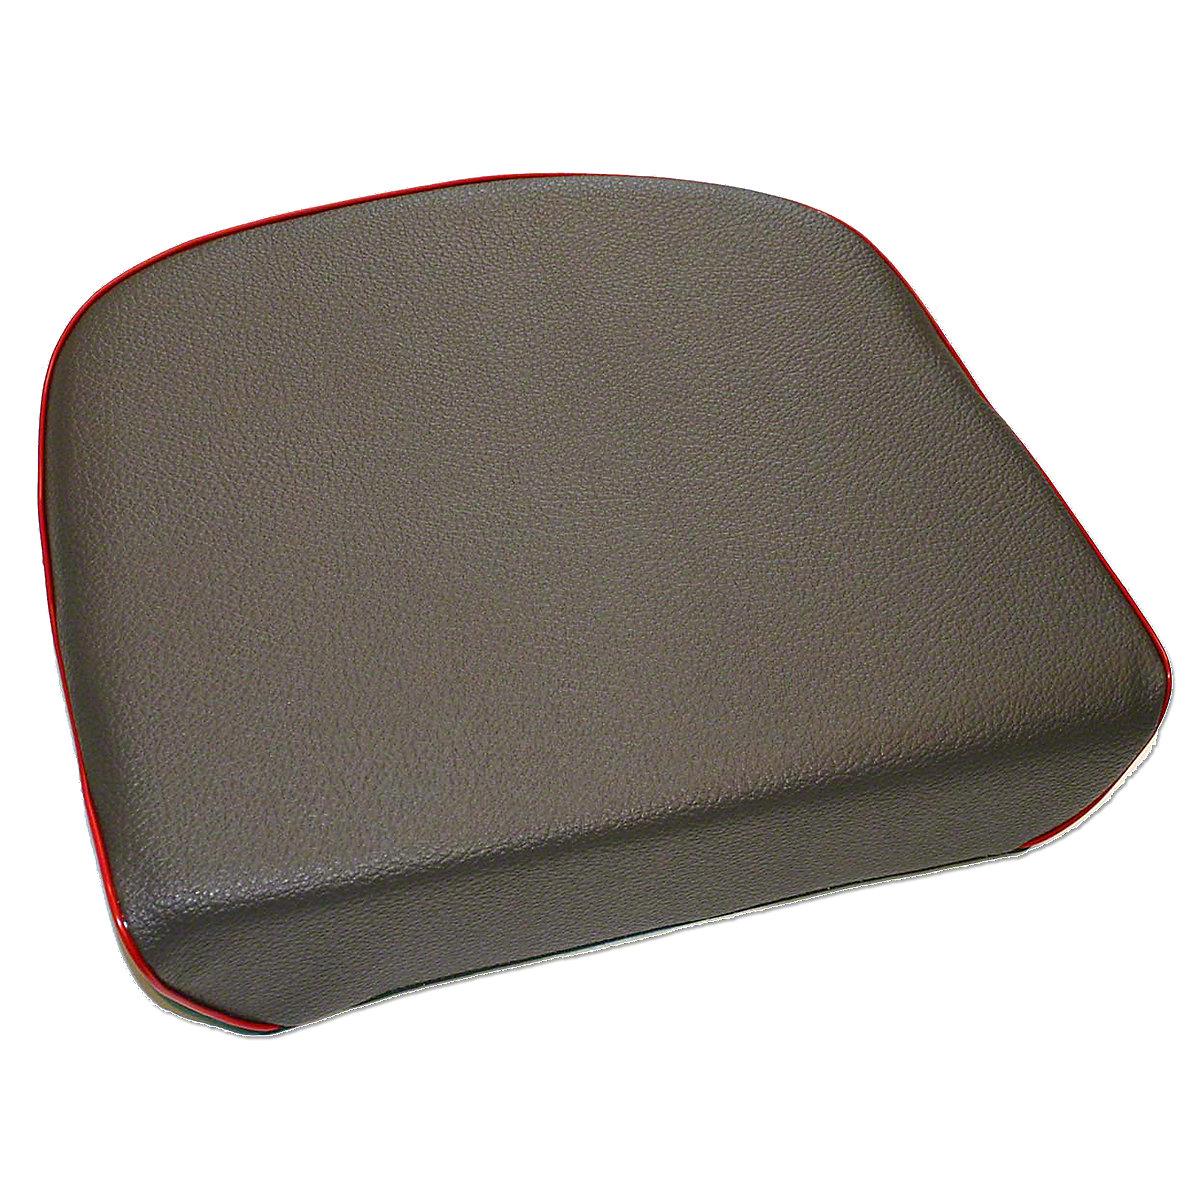 Massey 135 Seat : Mfs bottom seat cover for massey ferguson to